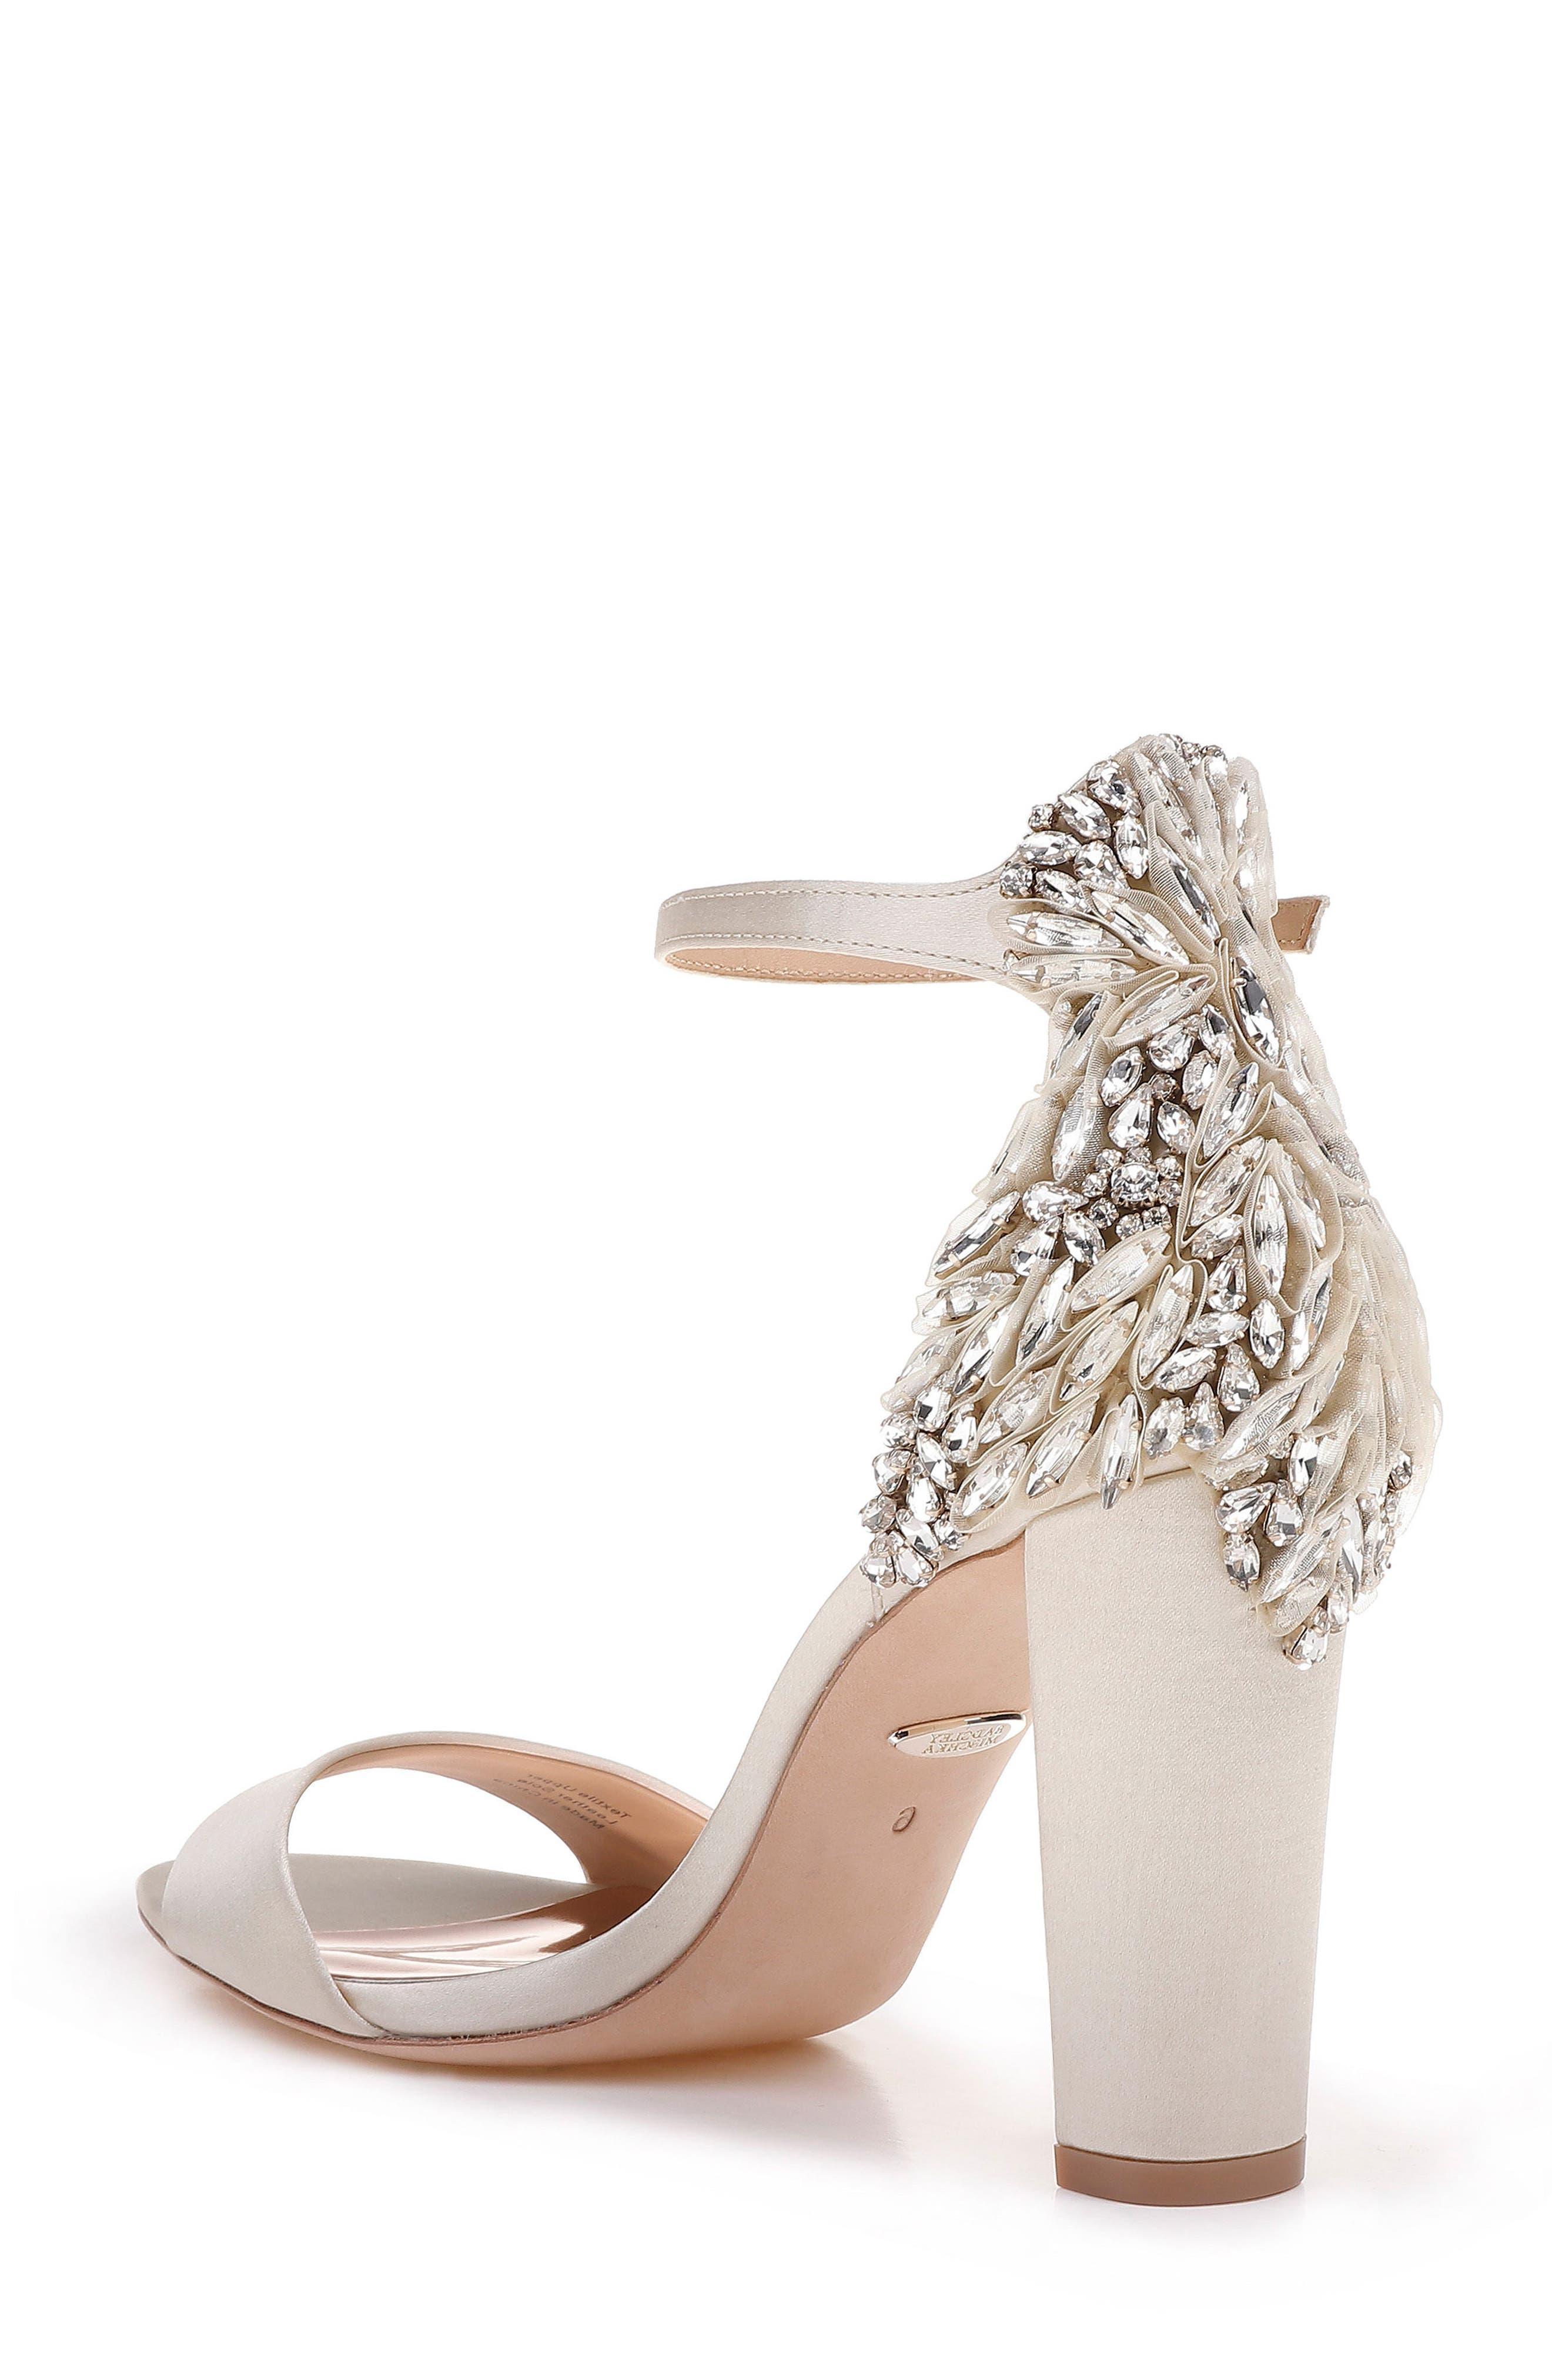 Badgley Mischka Women's Seina Embellished Satin Ankle Strap Sandals 7tv5f8f